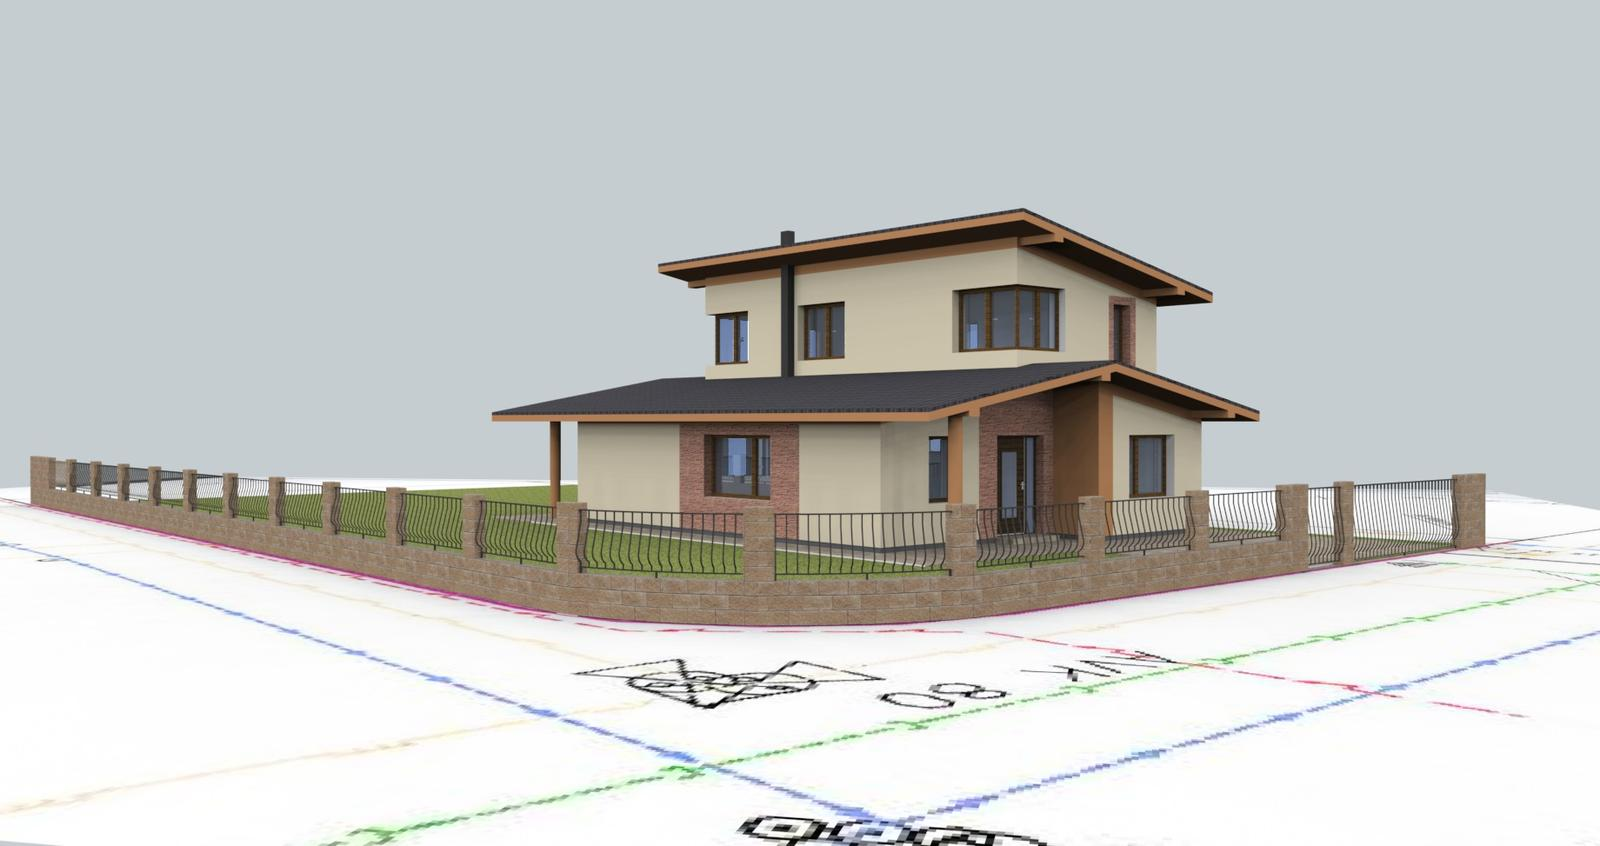 Prebiehajuce projekty - Návrh fasády s oplotením